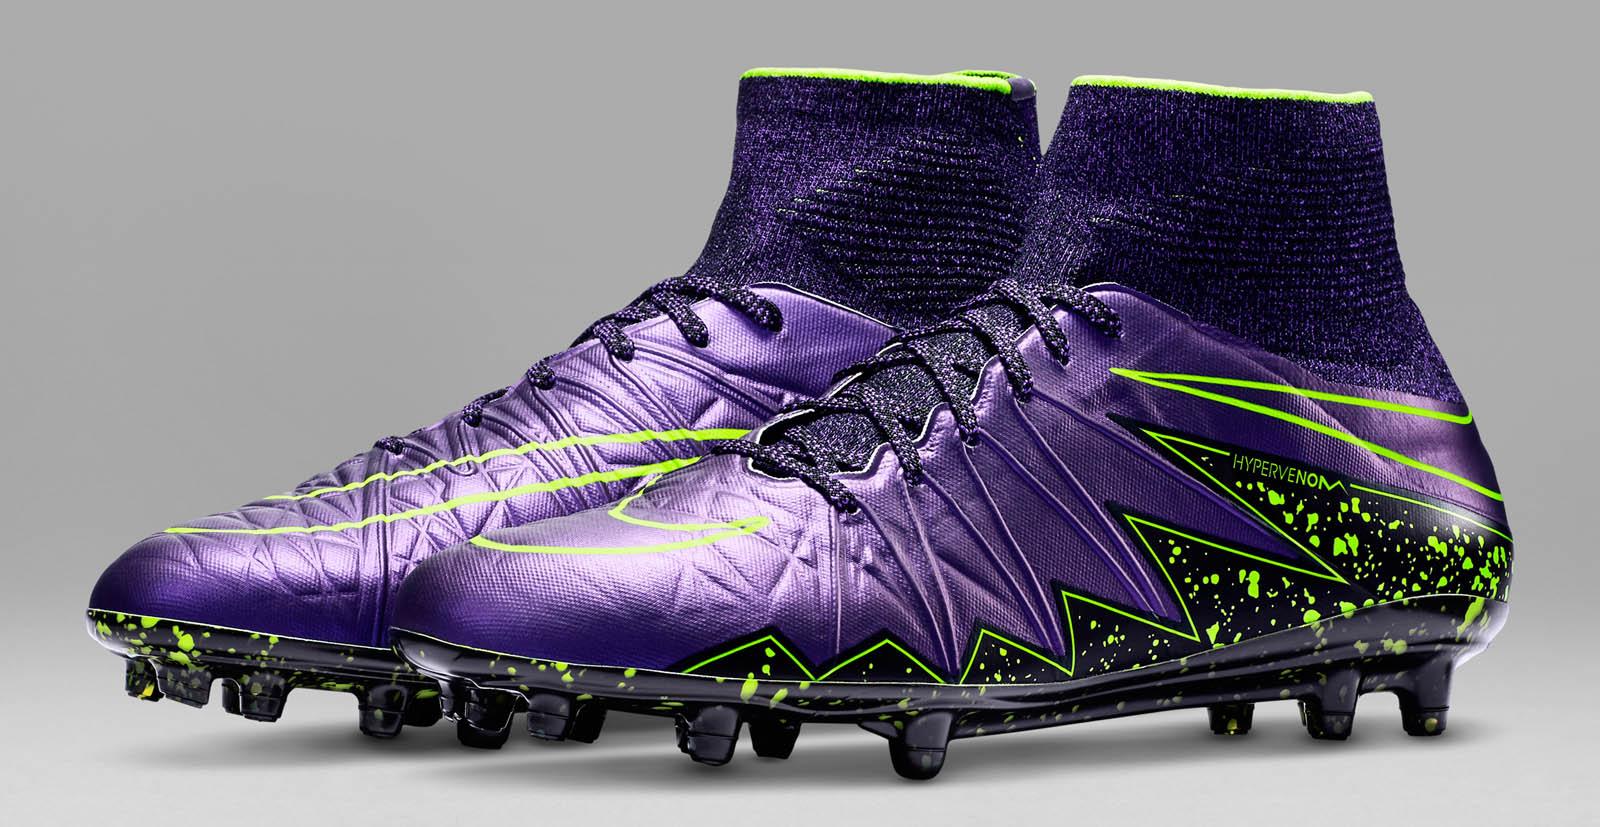 nouveau style b9a7d 4fcaf Nike Football Shoes Hypervenom 2016 agateassociates.co.uk